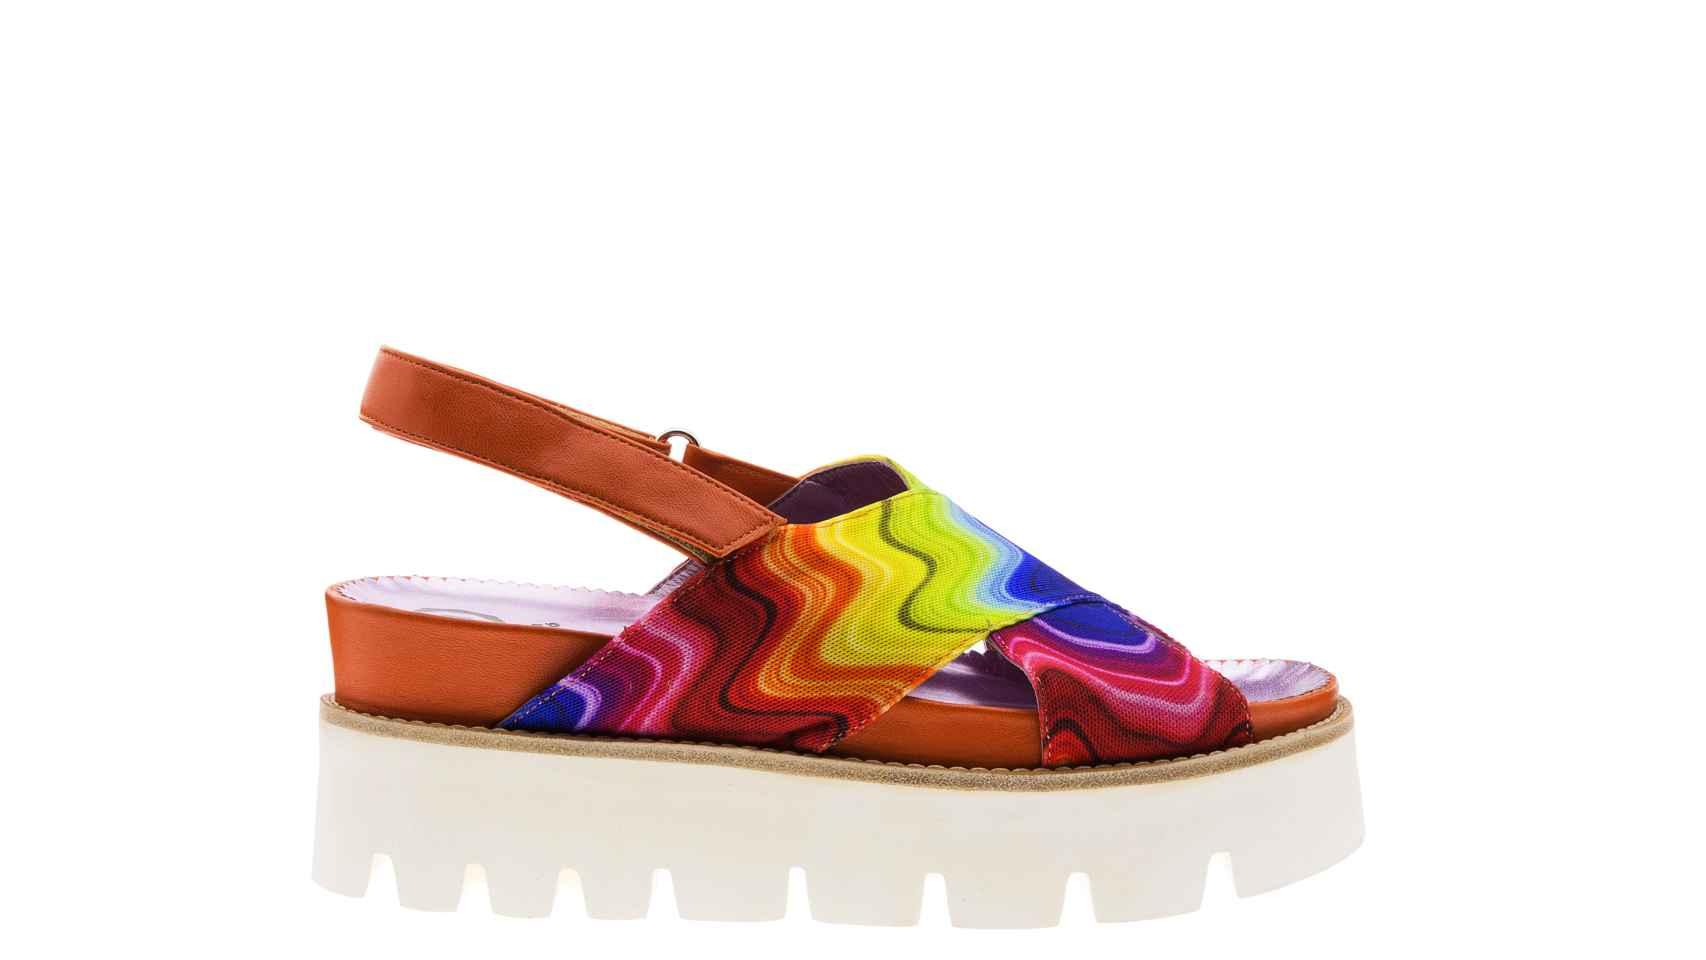 Sandalias multicolores, de Ursula Mascaró.